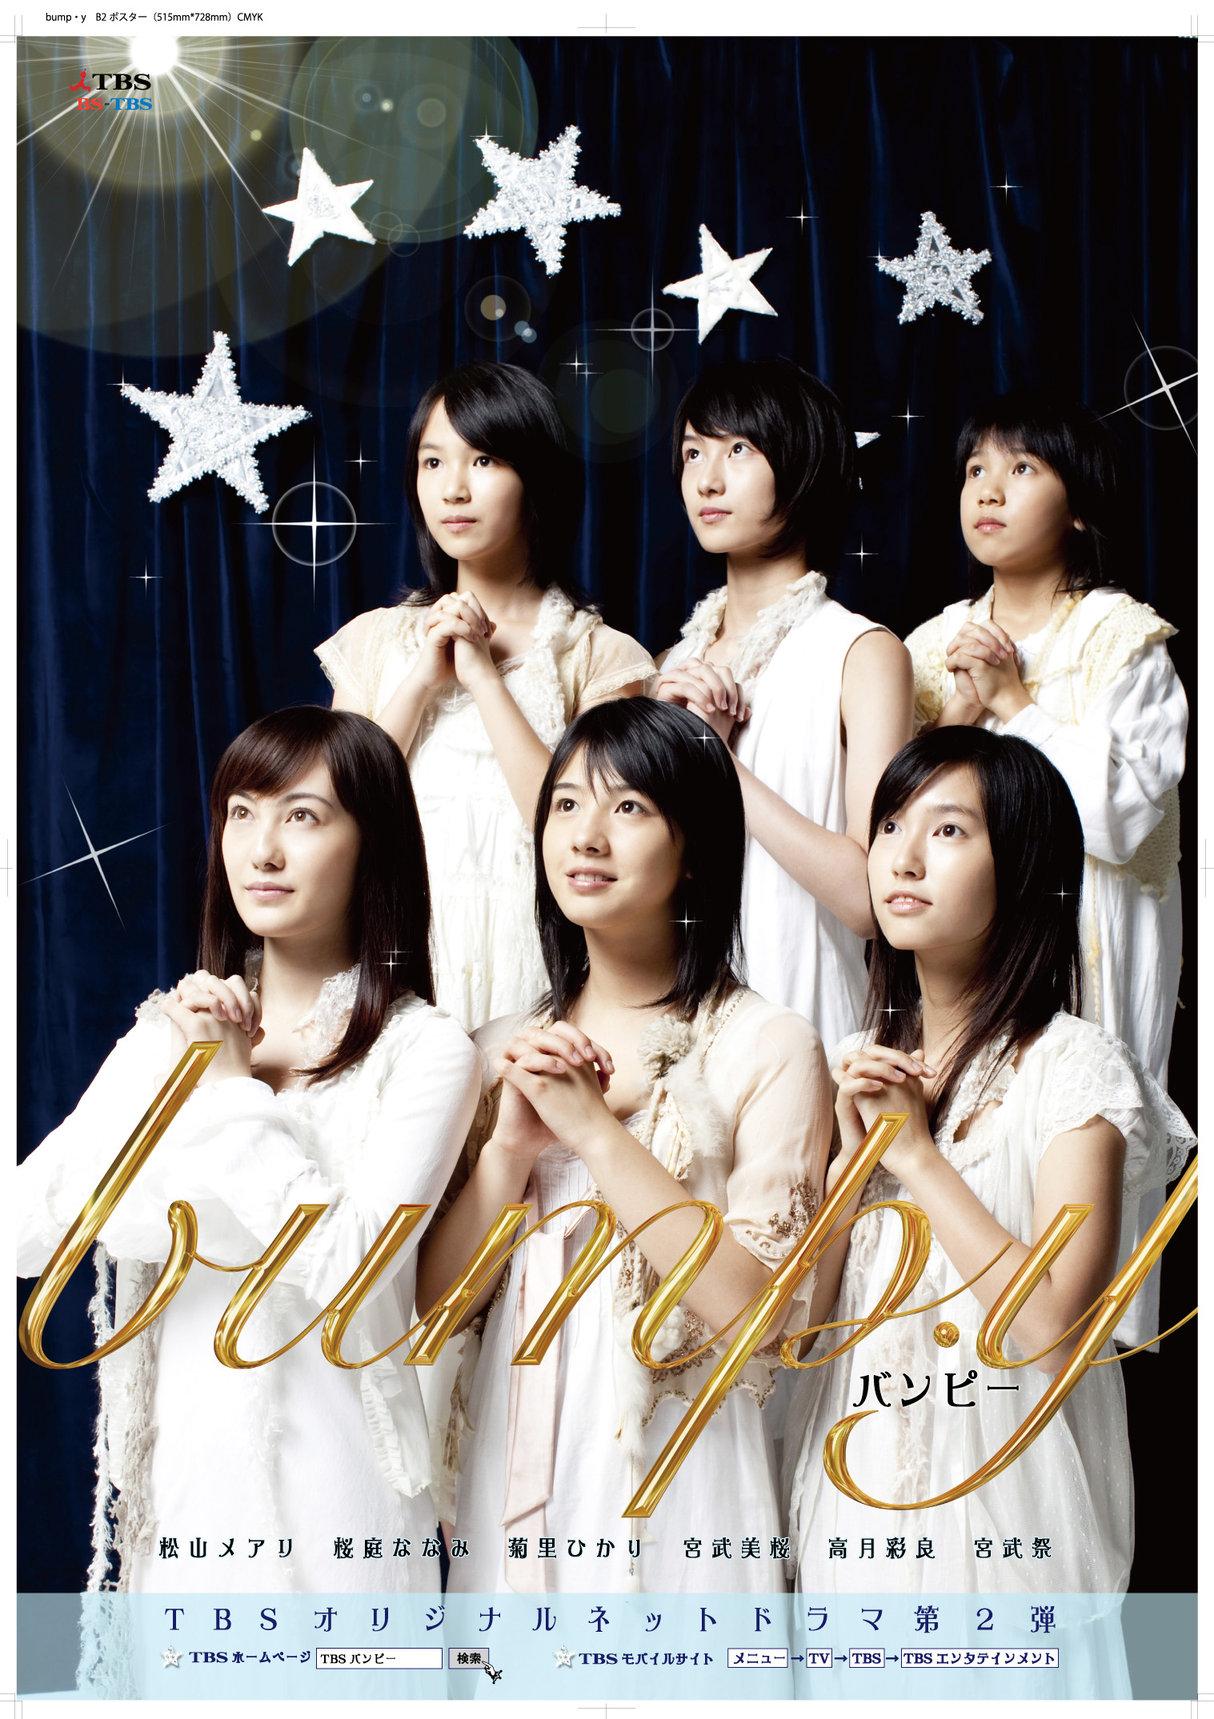 bump・y 12月9日よりチケット発売開始!! : る・ひまわり Back Stage